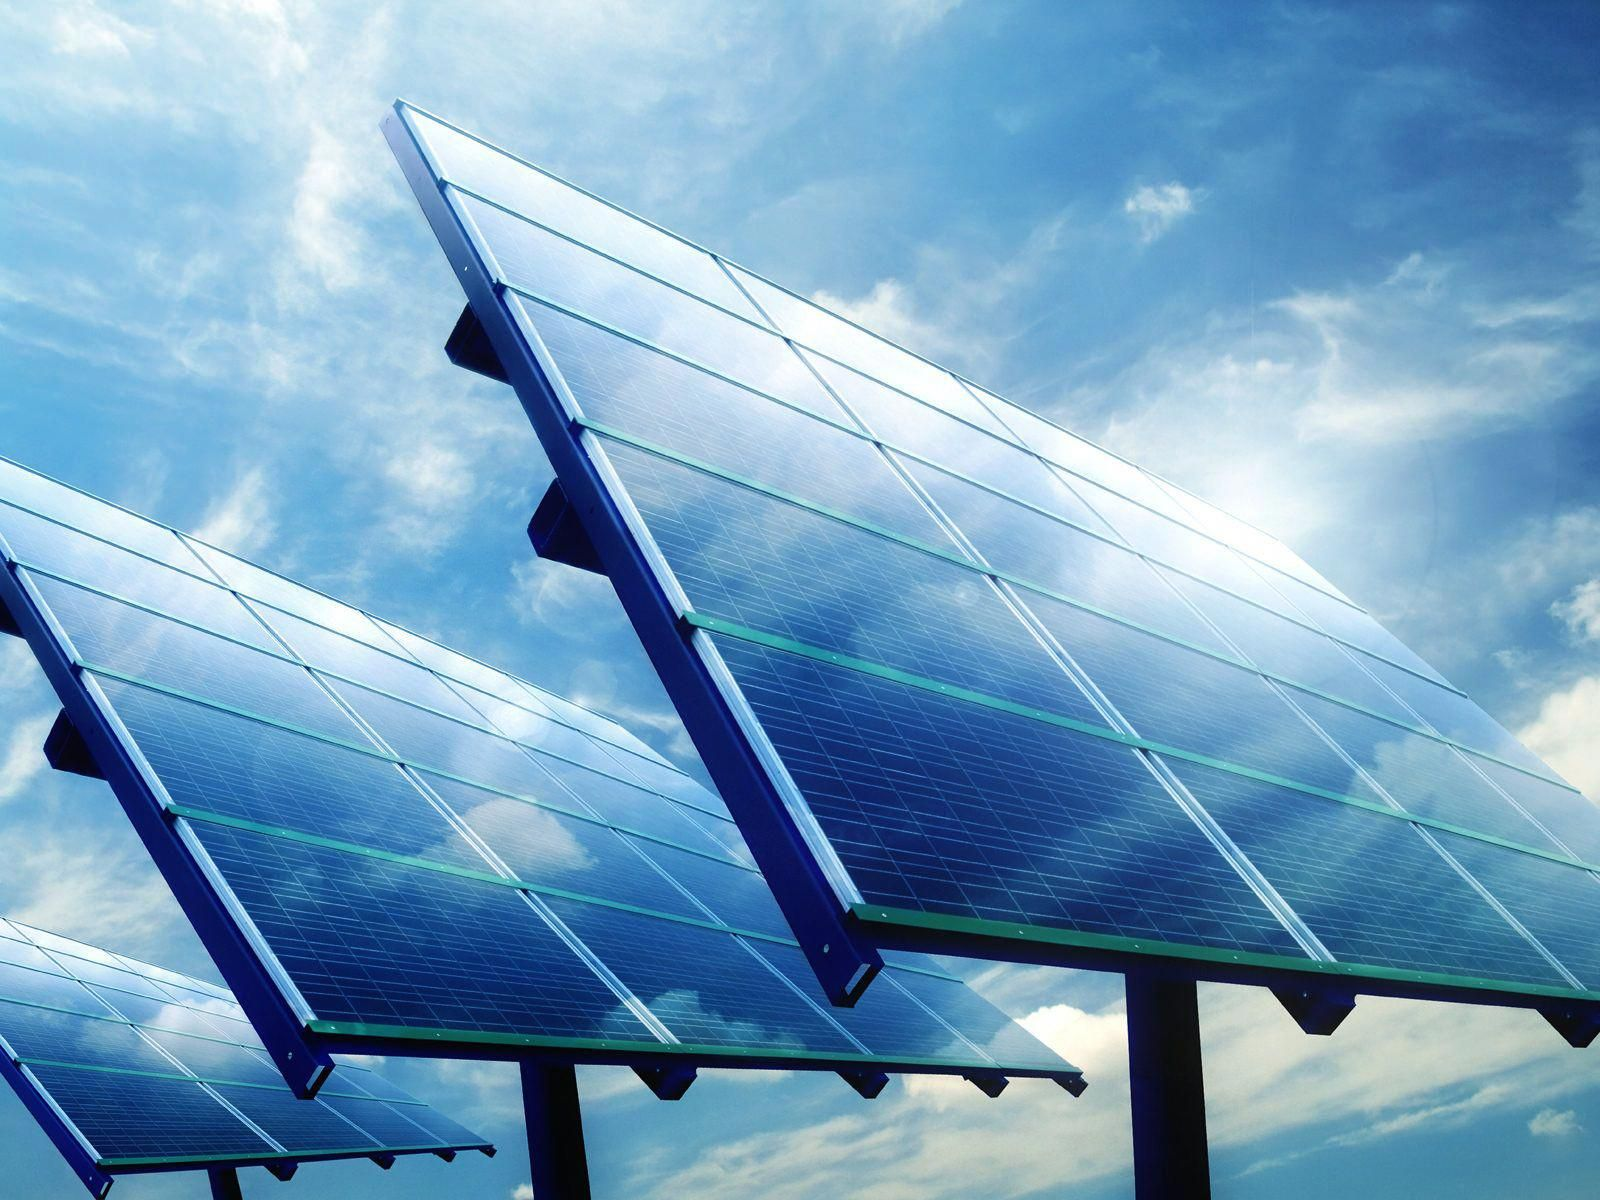 Best Solar Power Plants In Rajasthan Rays Power Infra Pvt Ltd Is An Environmental Friendly Energy Effi In 2020 Solar Panels Solar Installation Best Solar Panels